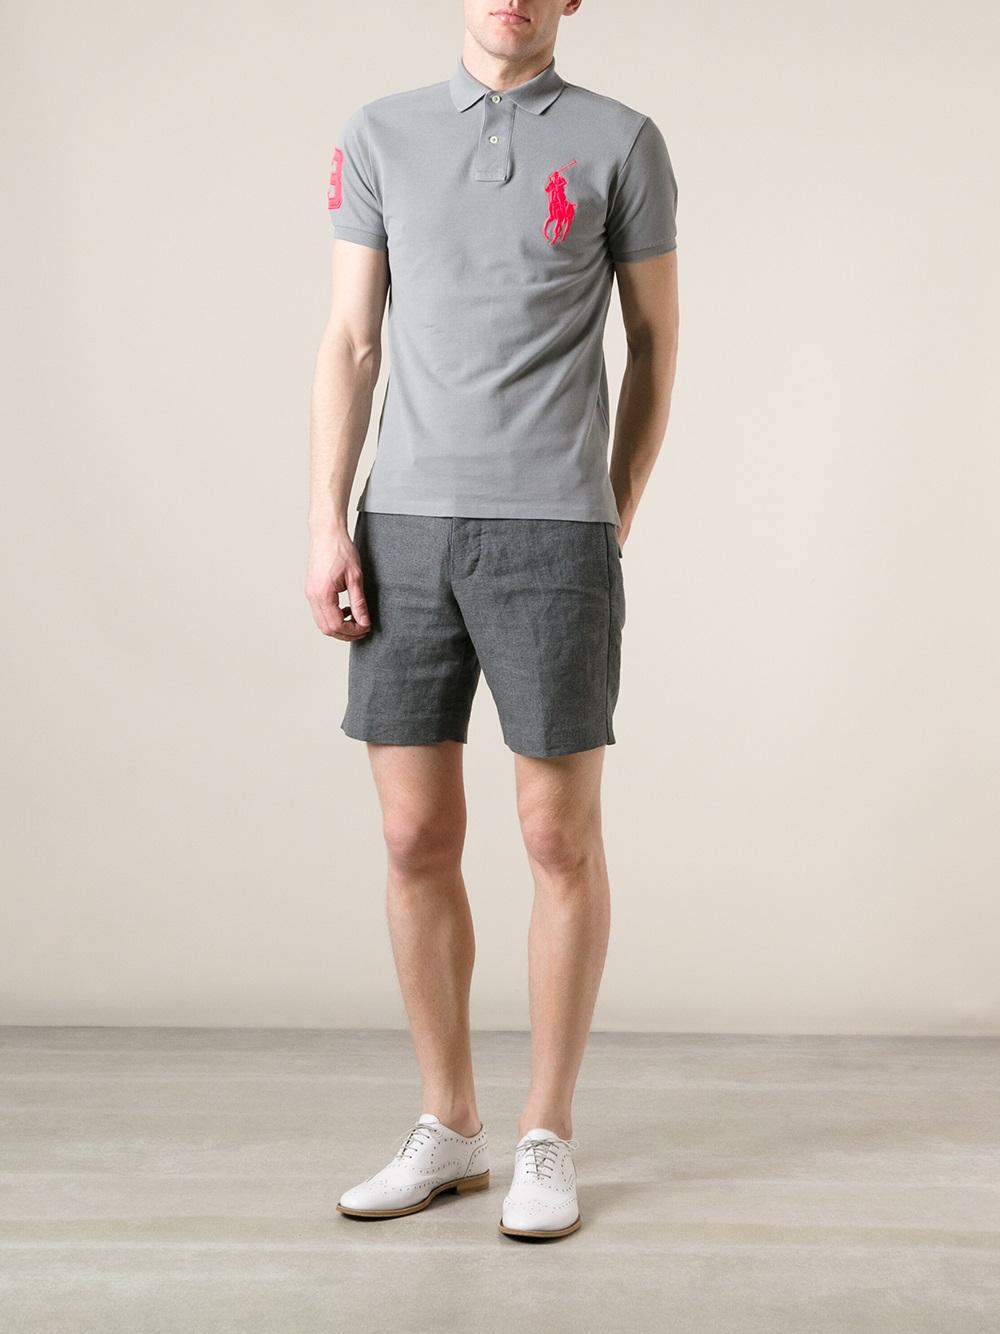 Lyst Polo Ralph Lauren Logo Polo Shirt In Gray For Men